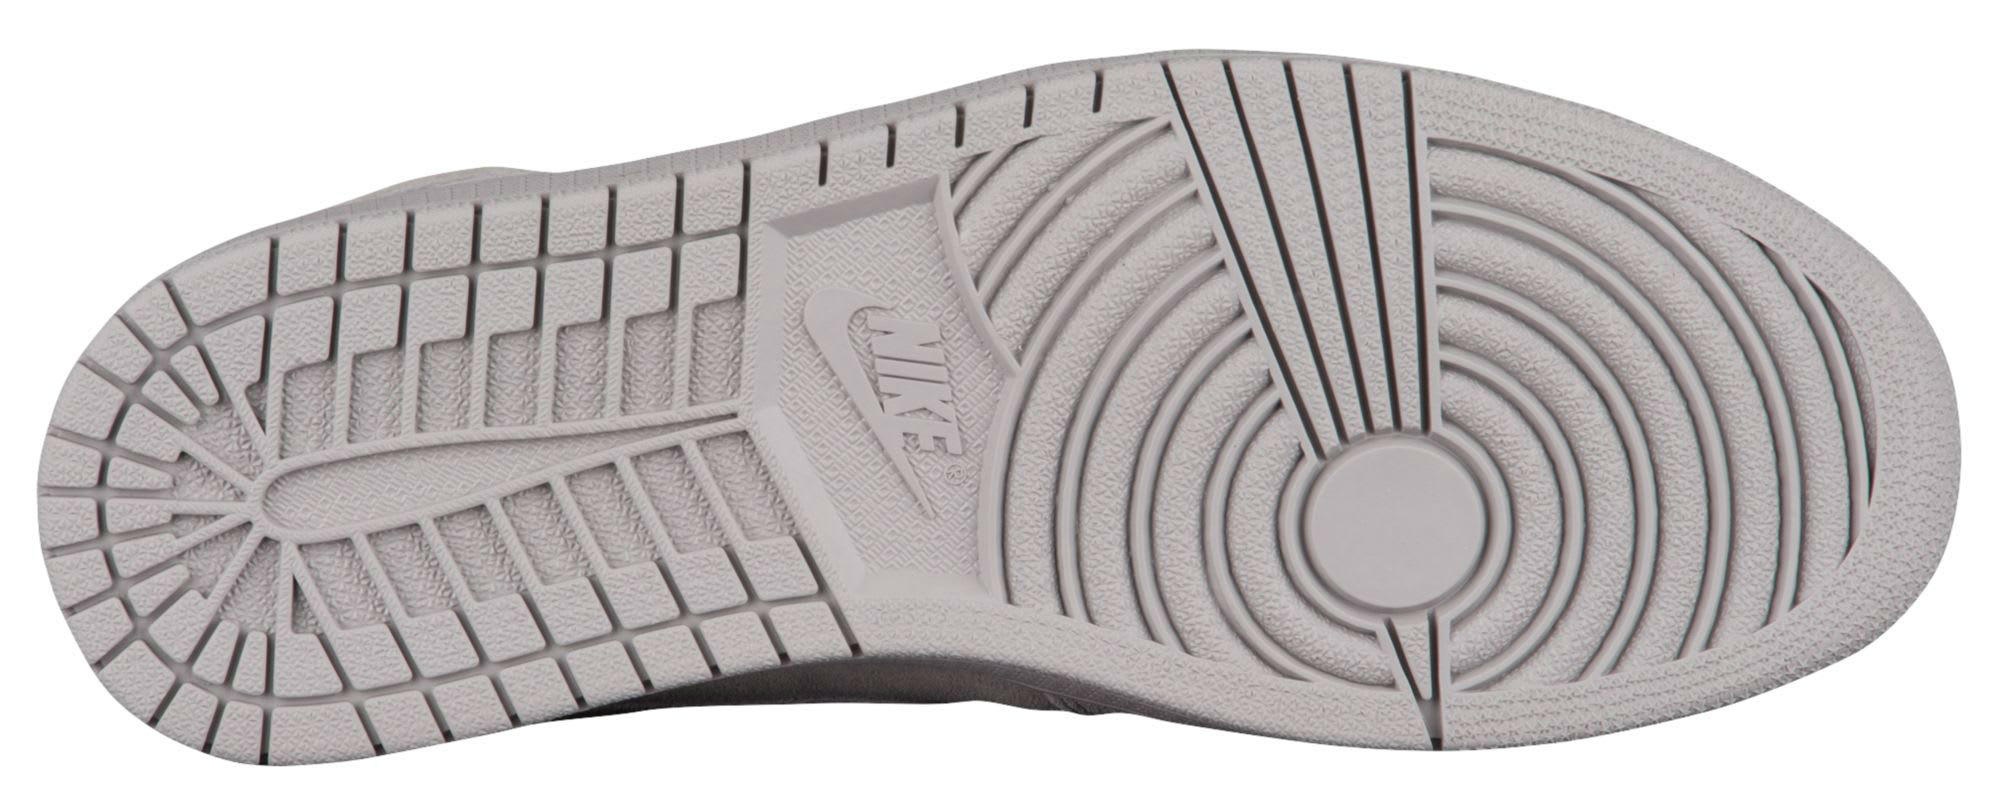 20dfdae60f8f82 Air Jordan 1 Wolf Grey Suede Release Date Profile